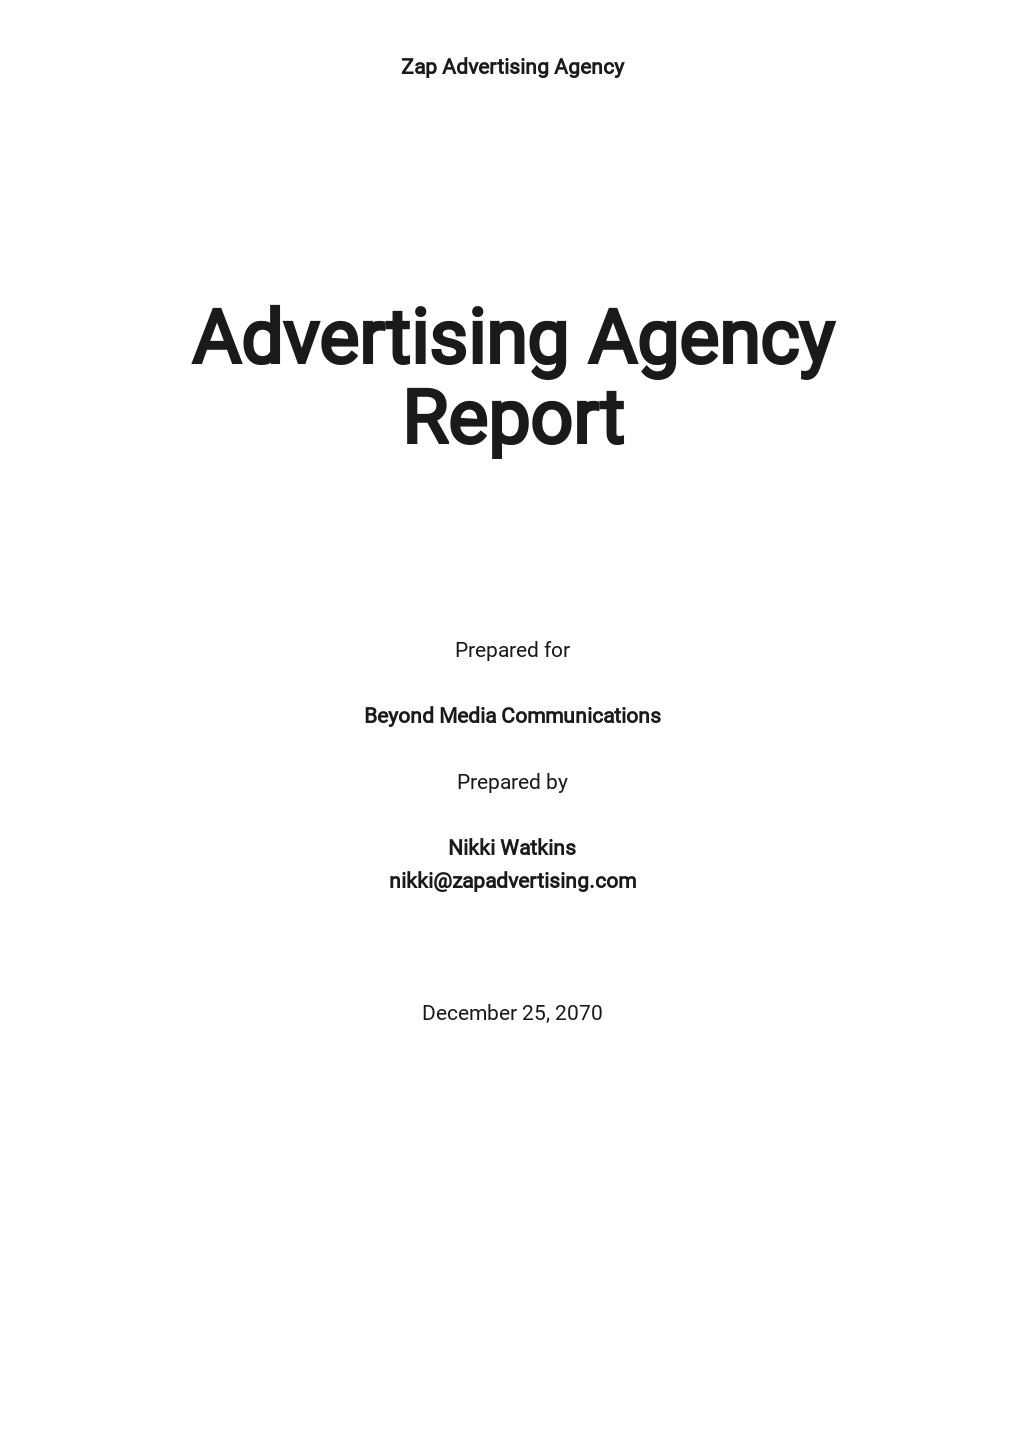 Free Sample Advertising Agency Report Template.jpe